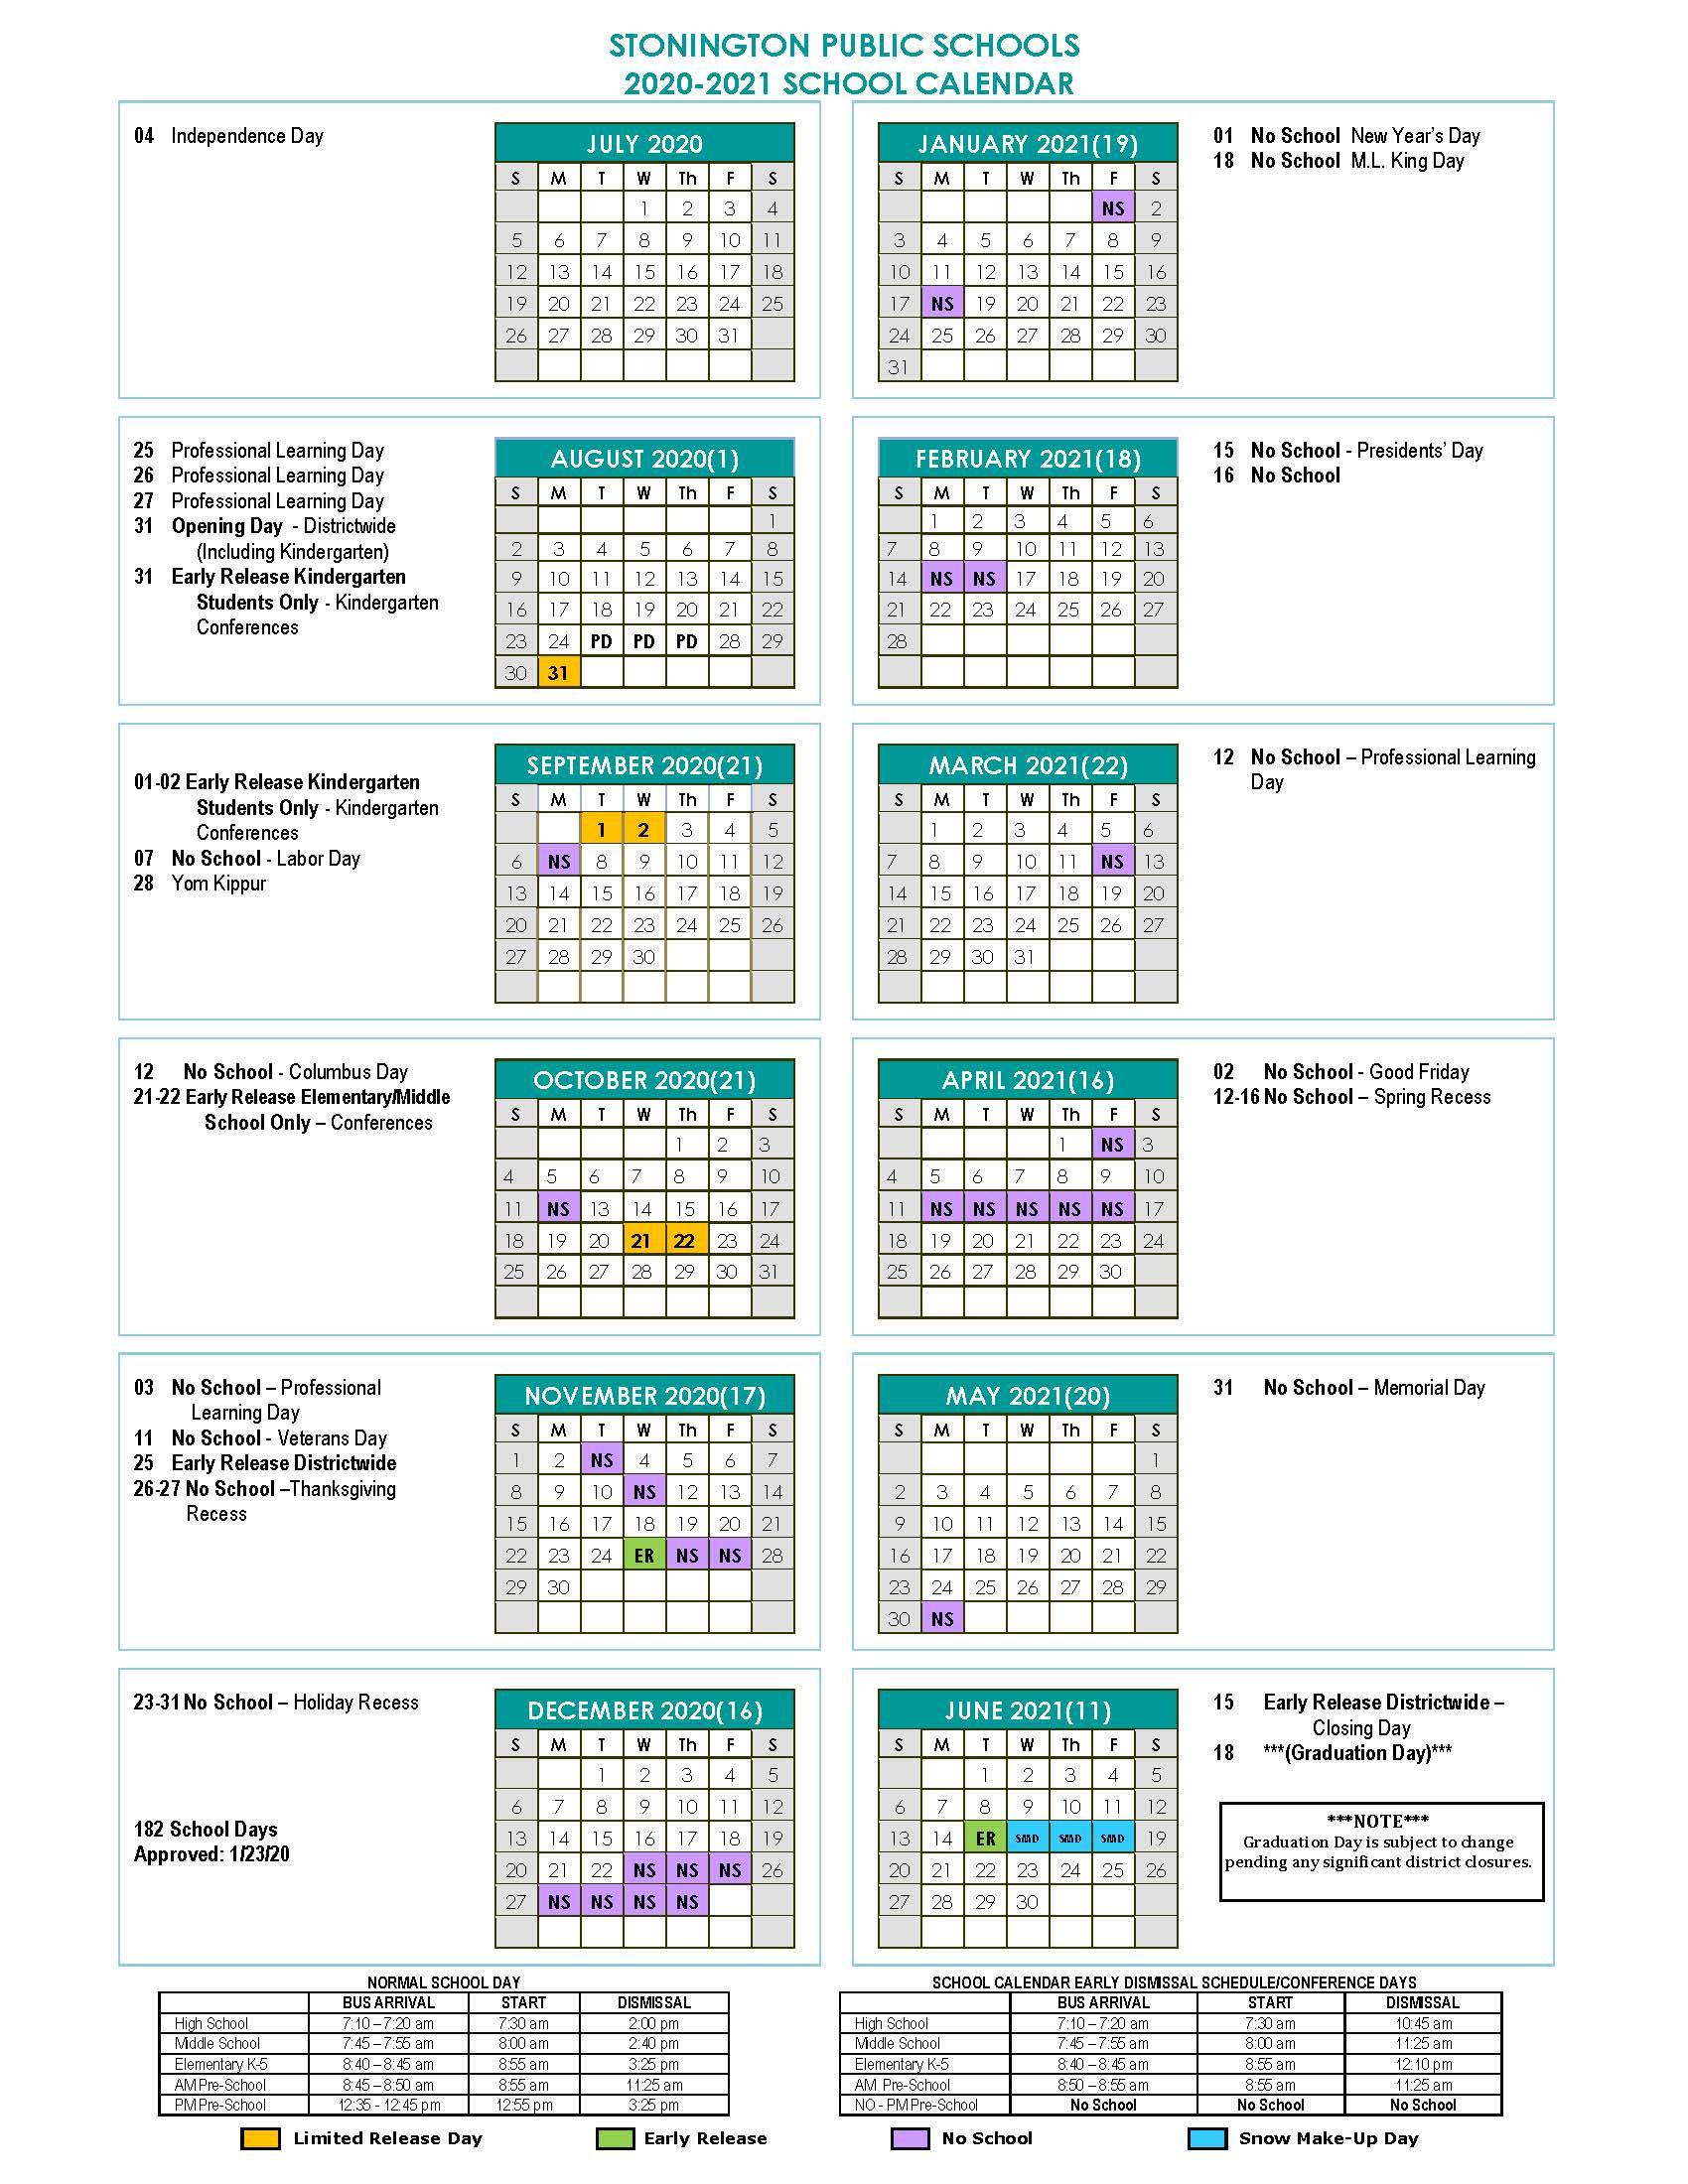 Story Details – Vernon Public Schools For East Hartford School Calendar 2021 2021